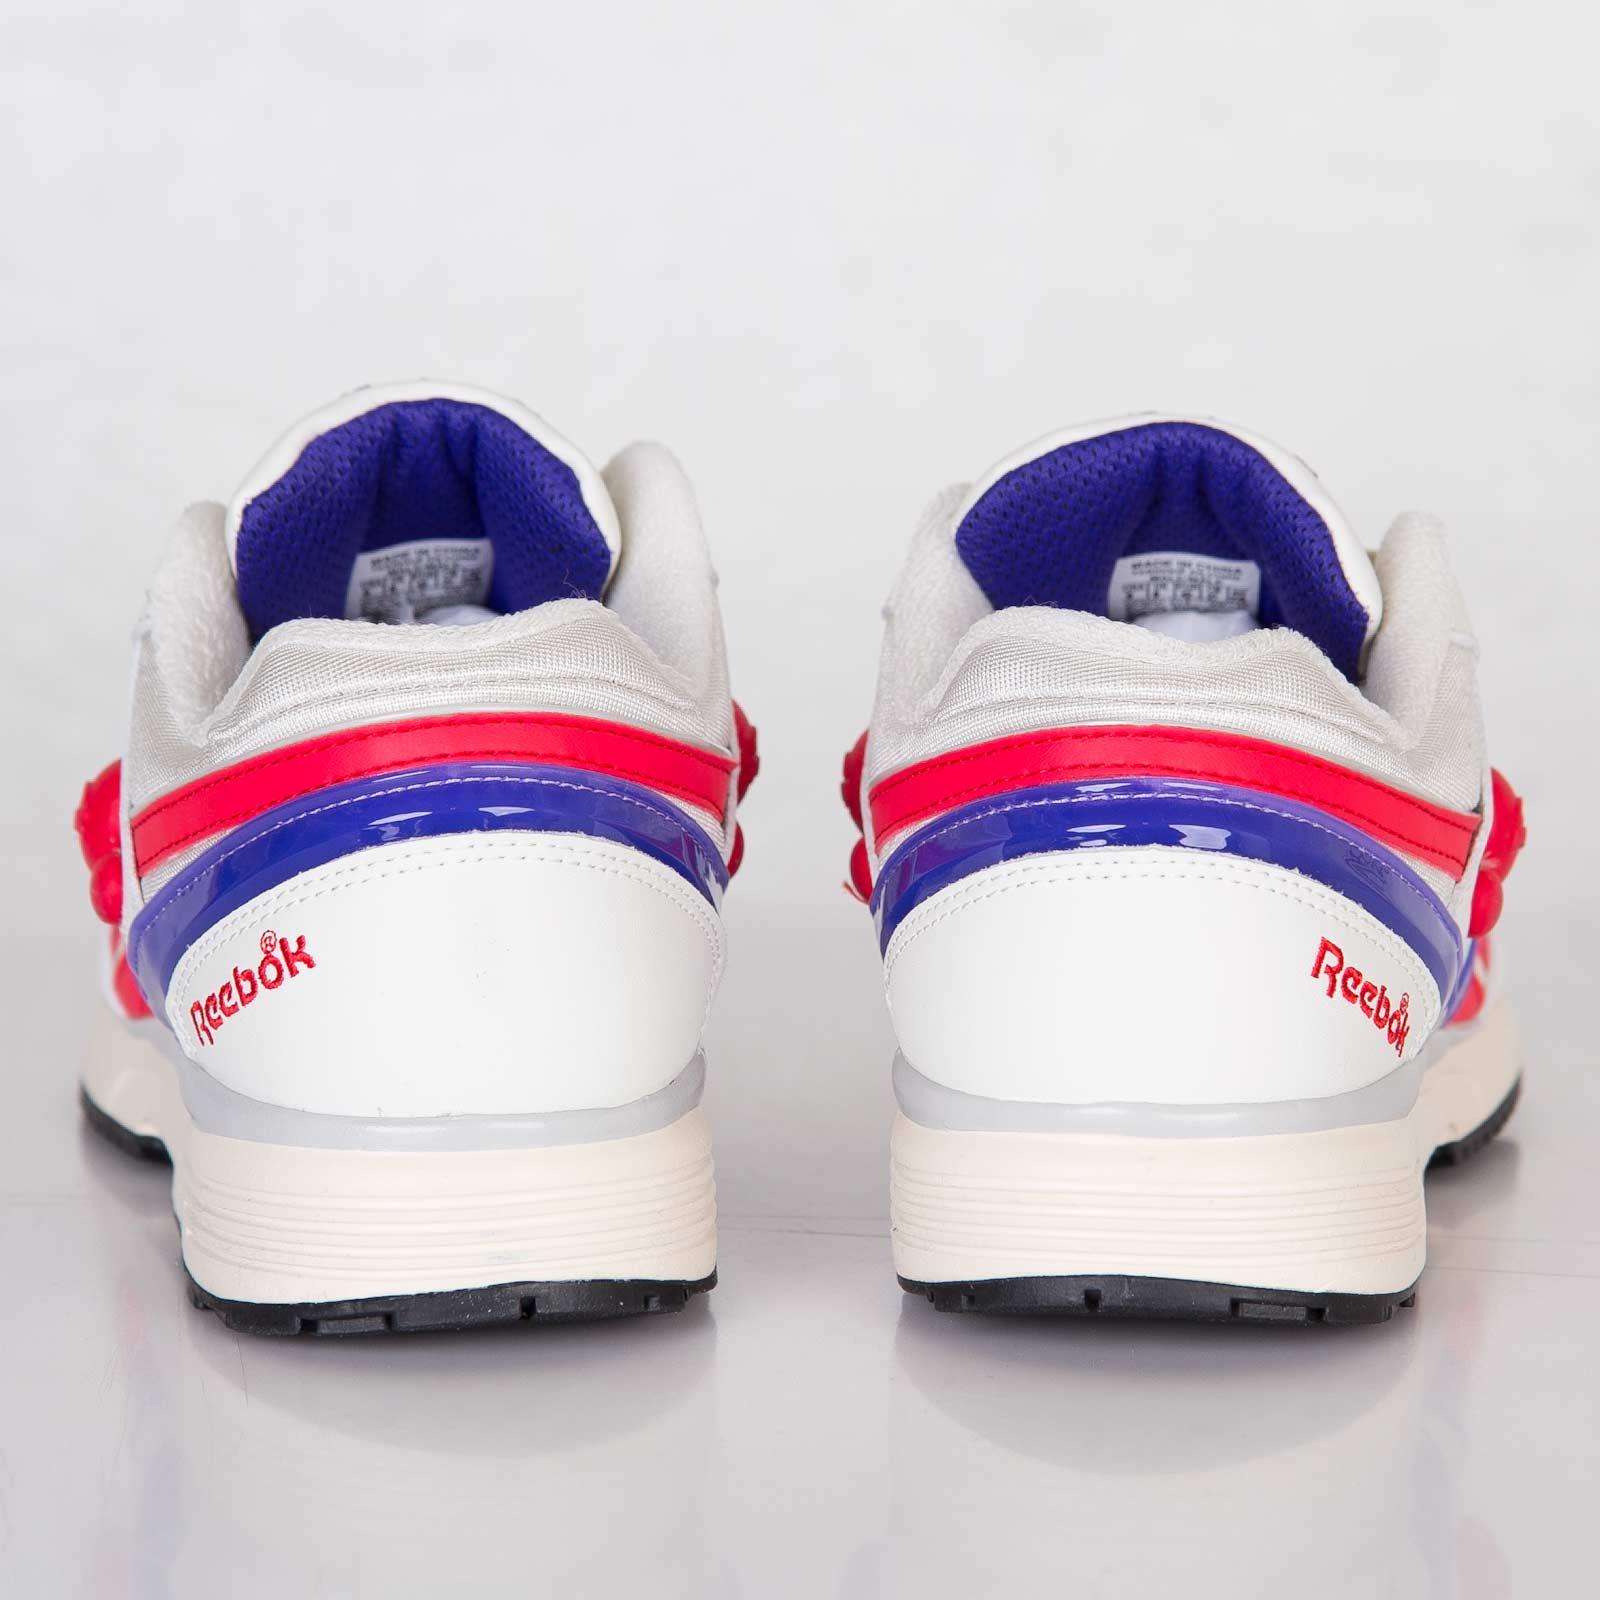 6477fff8e3ee4d Reebok Pump Running Dual Vintage - V60185 - Sneakersnstuff ...